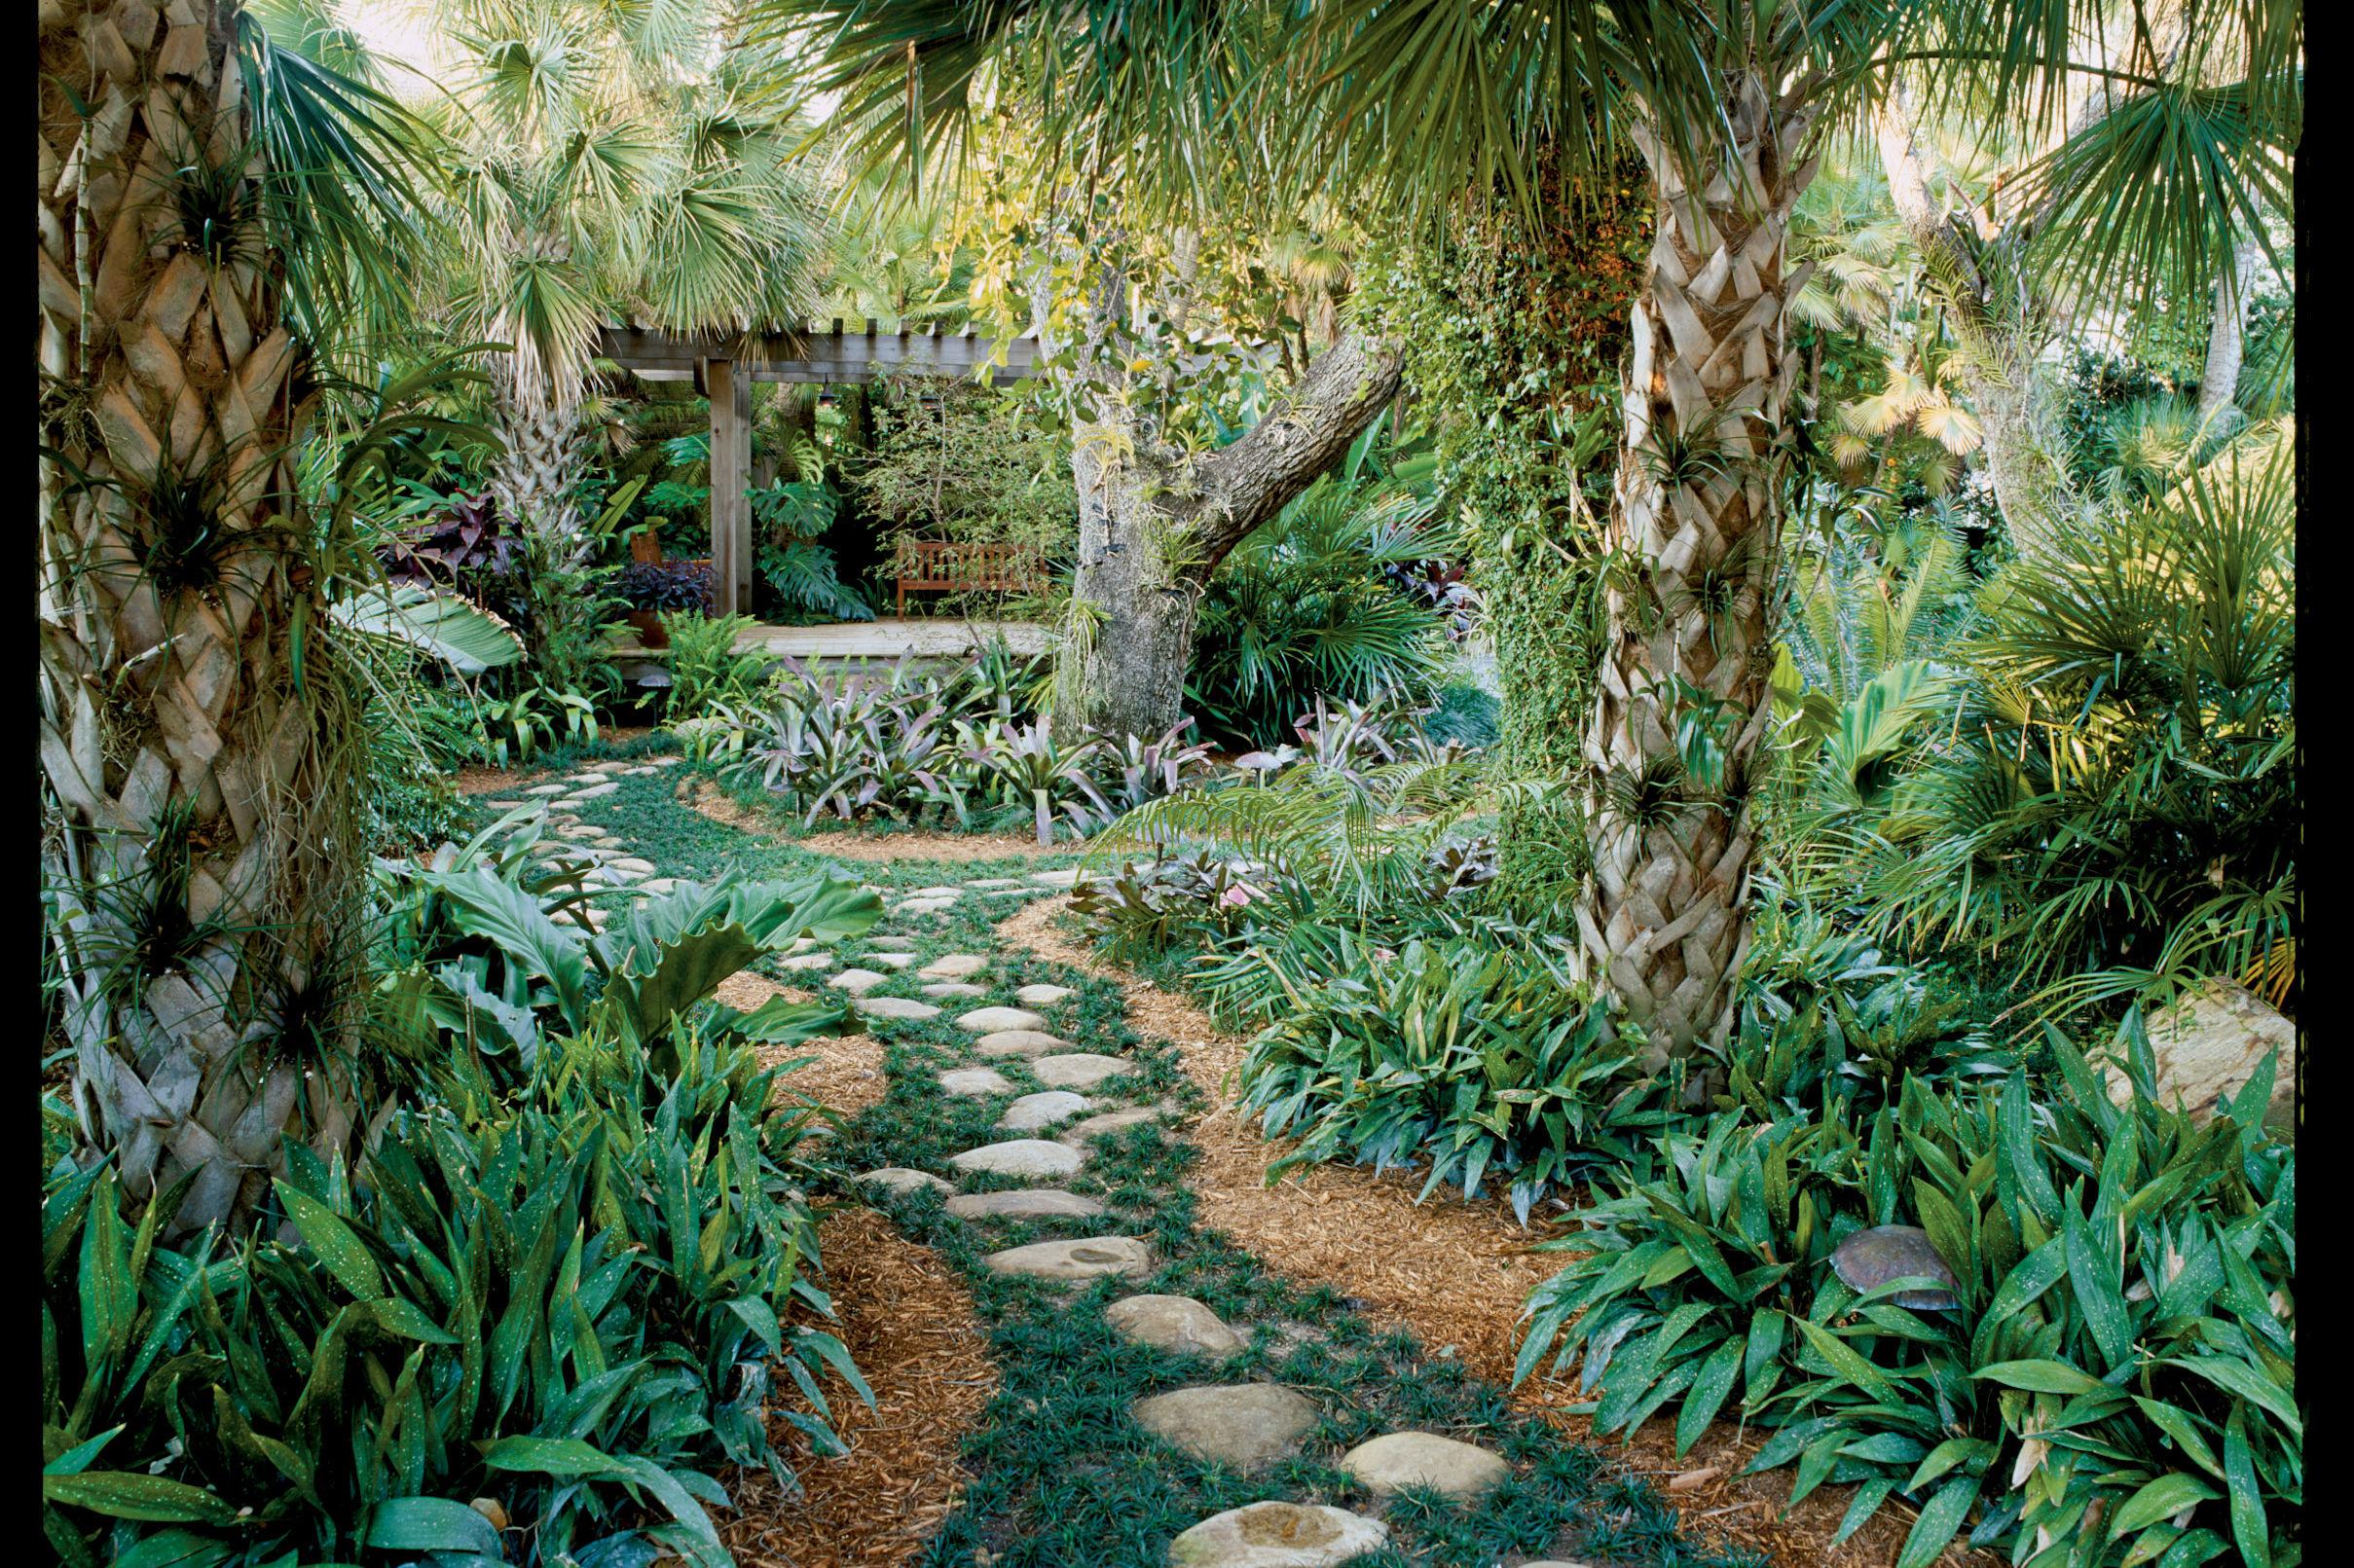 jardin exotique plante vegetation